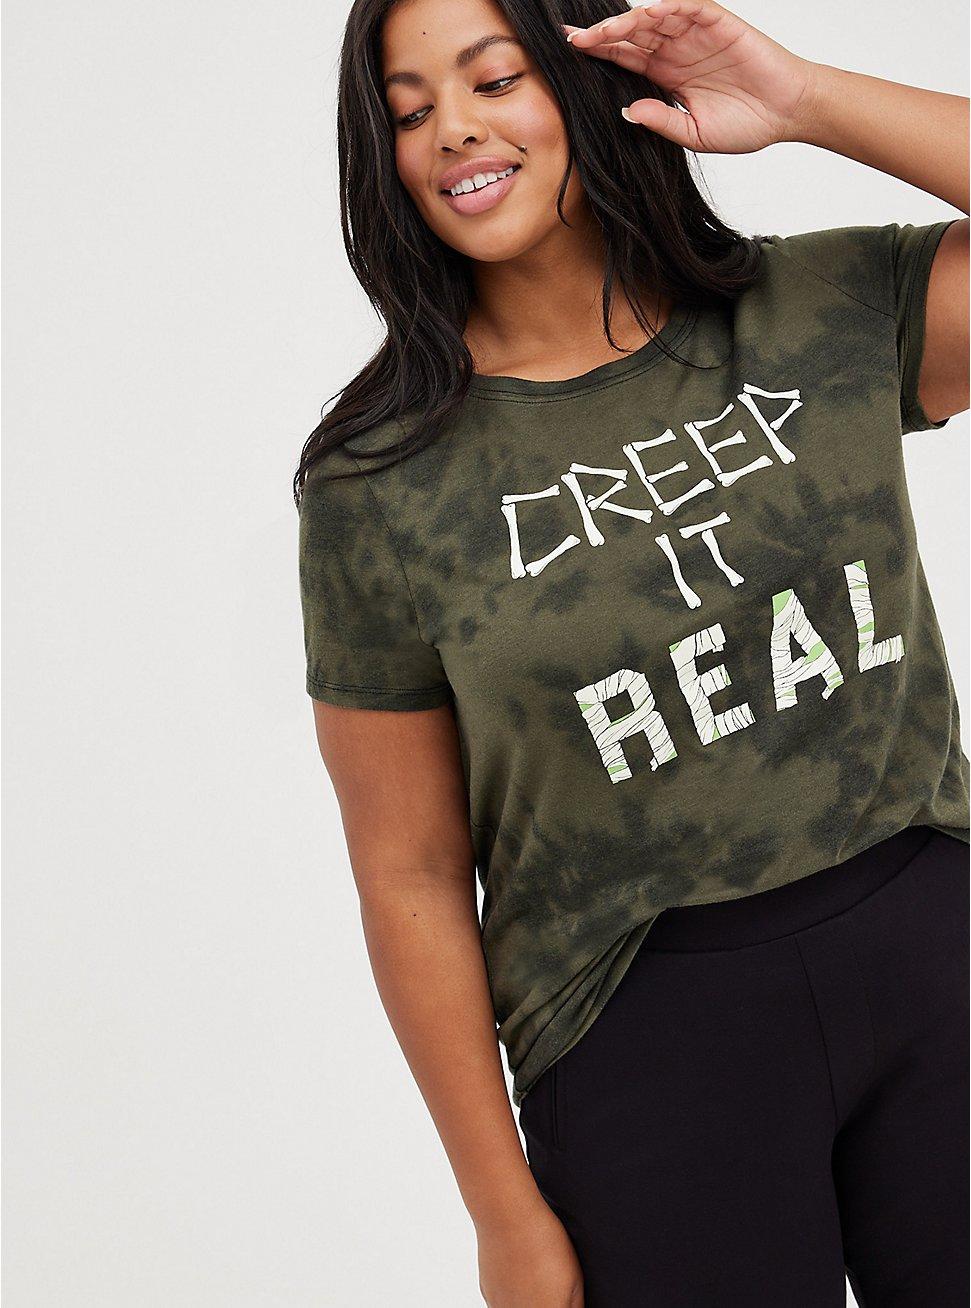 Everyday Tee - Signature Jersey Creep It Real Tie-Dye Green, DEEP DEPTHS, hi-res